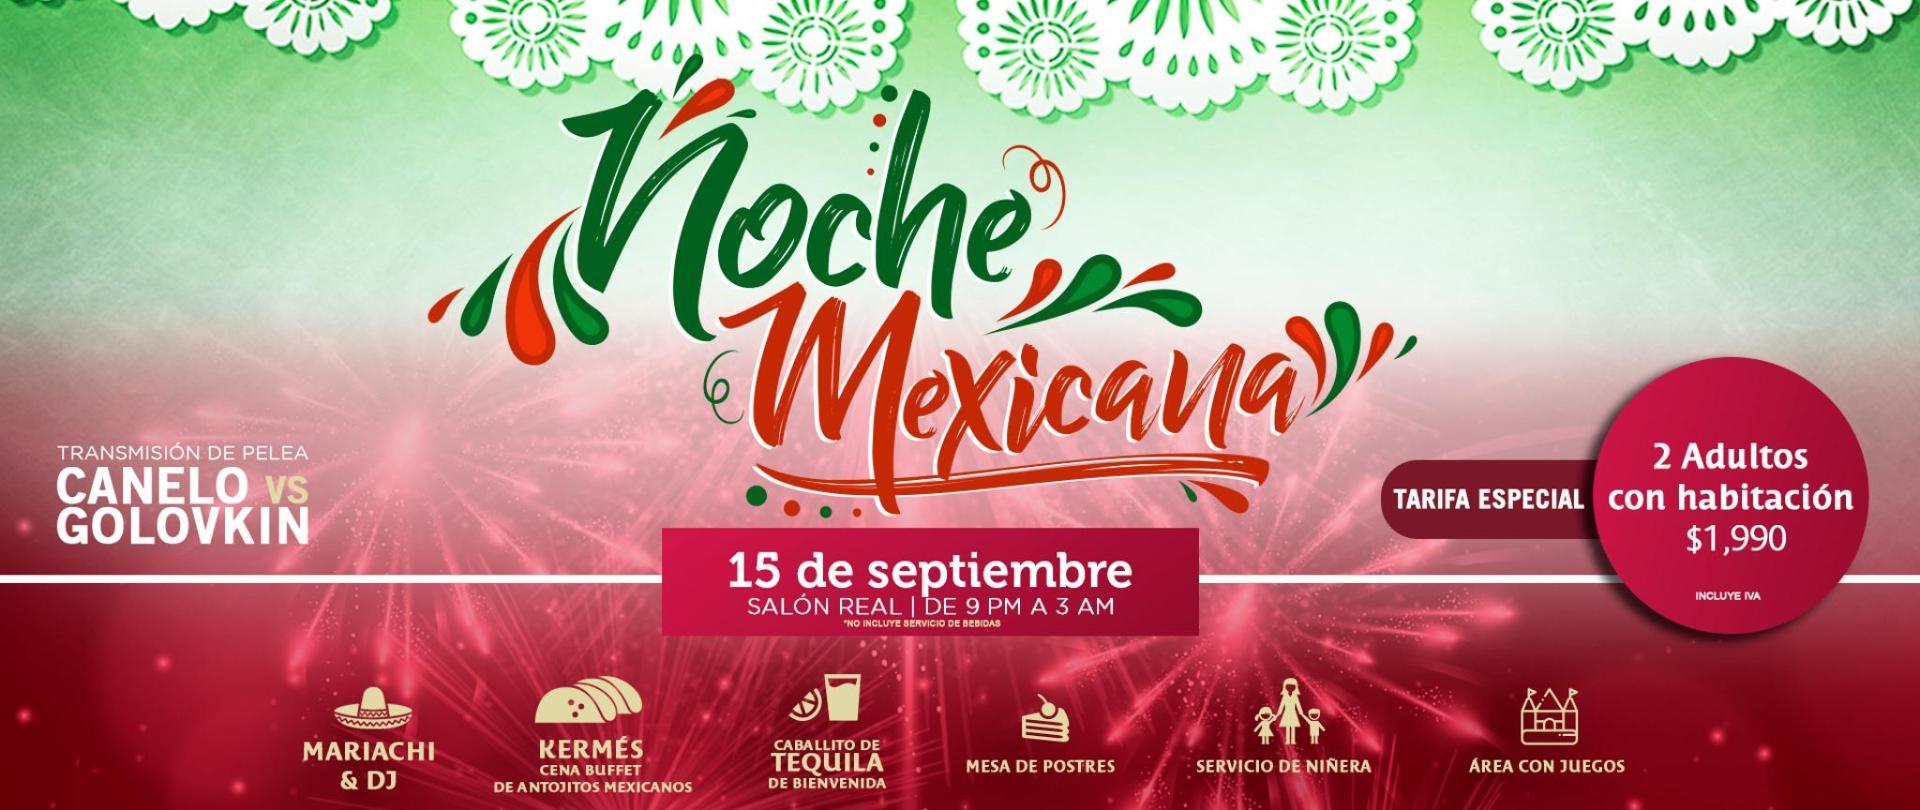 Web_FiestaMexicana.png